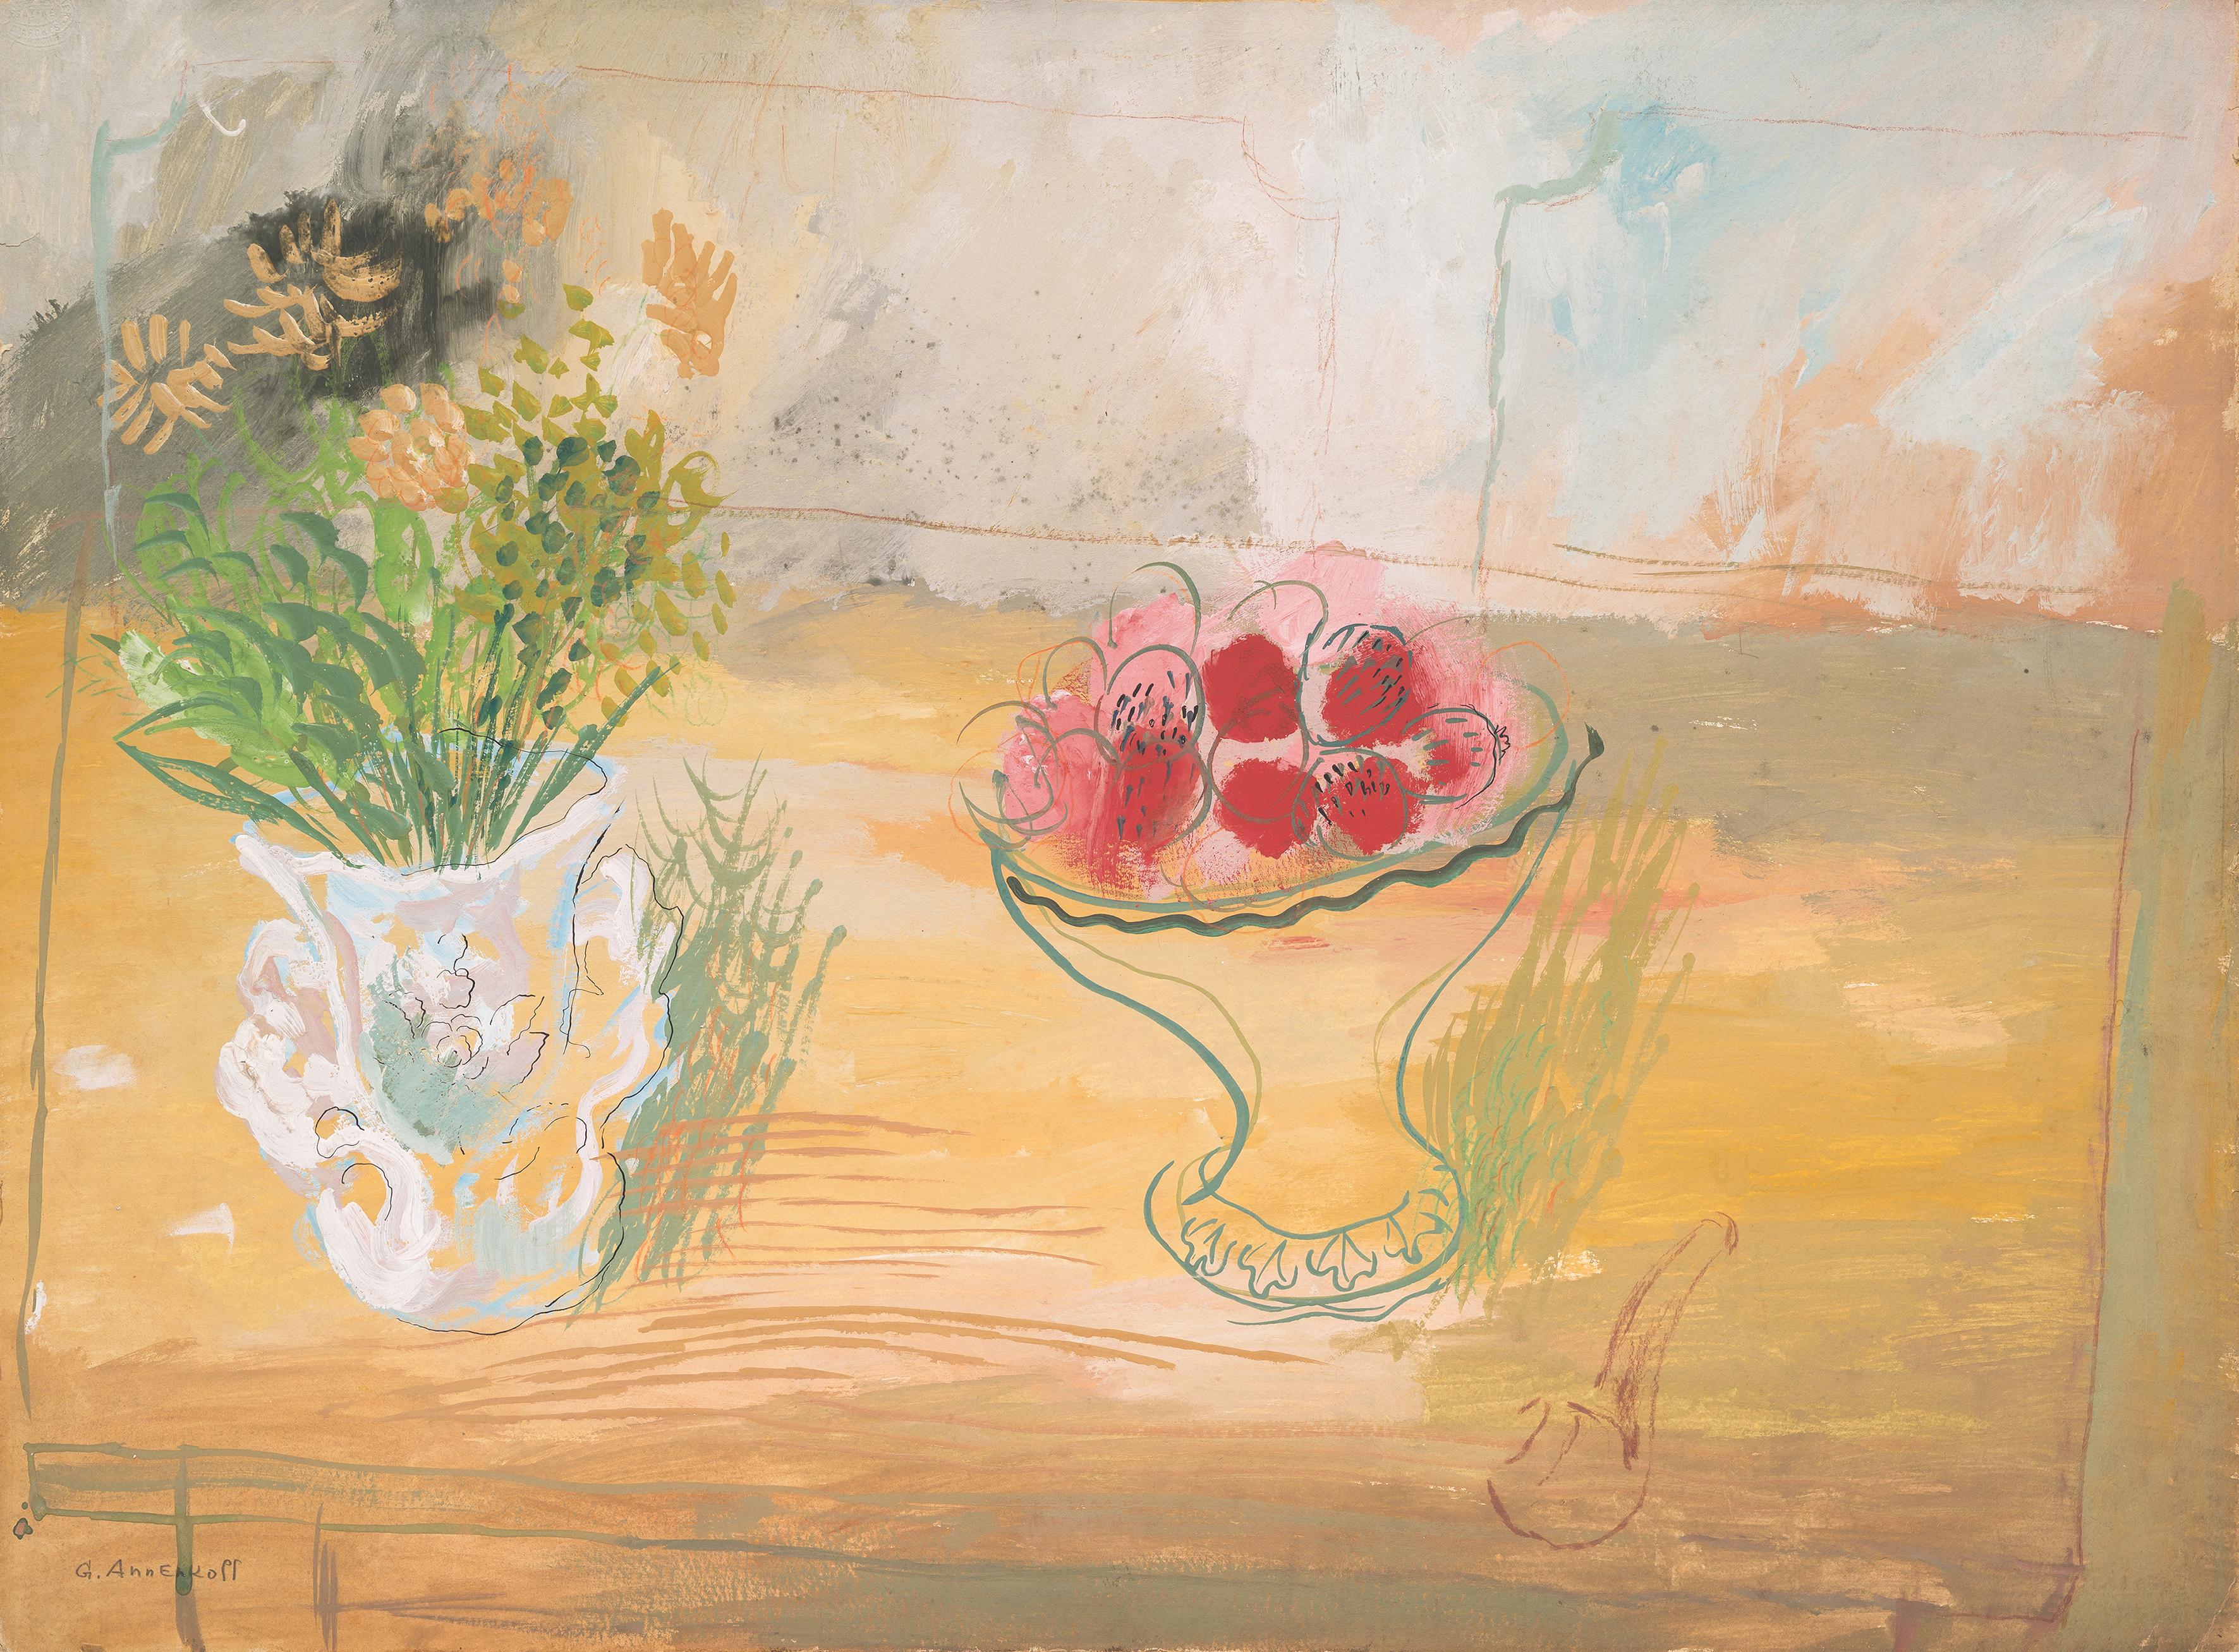 Still Life, Yuri Annenkov. 1930, gouache on paper. Image: Tessier